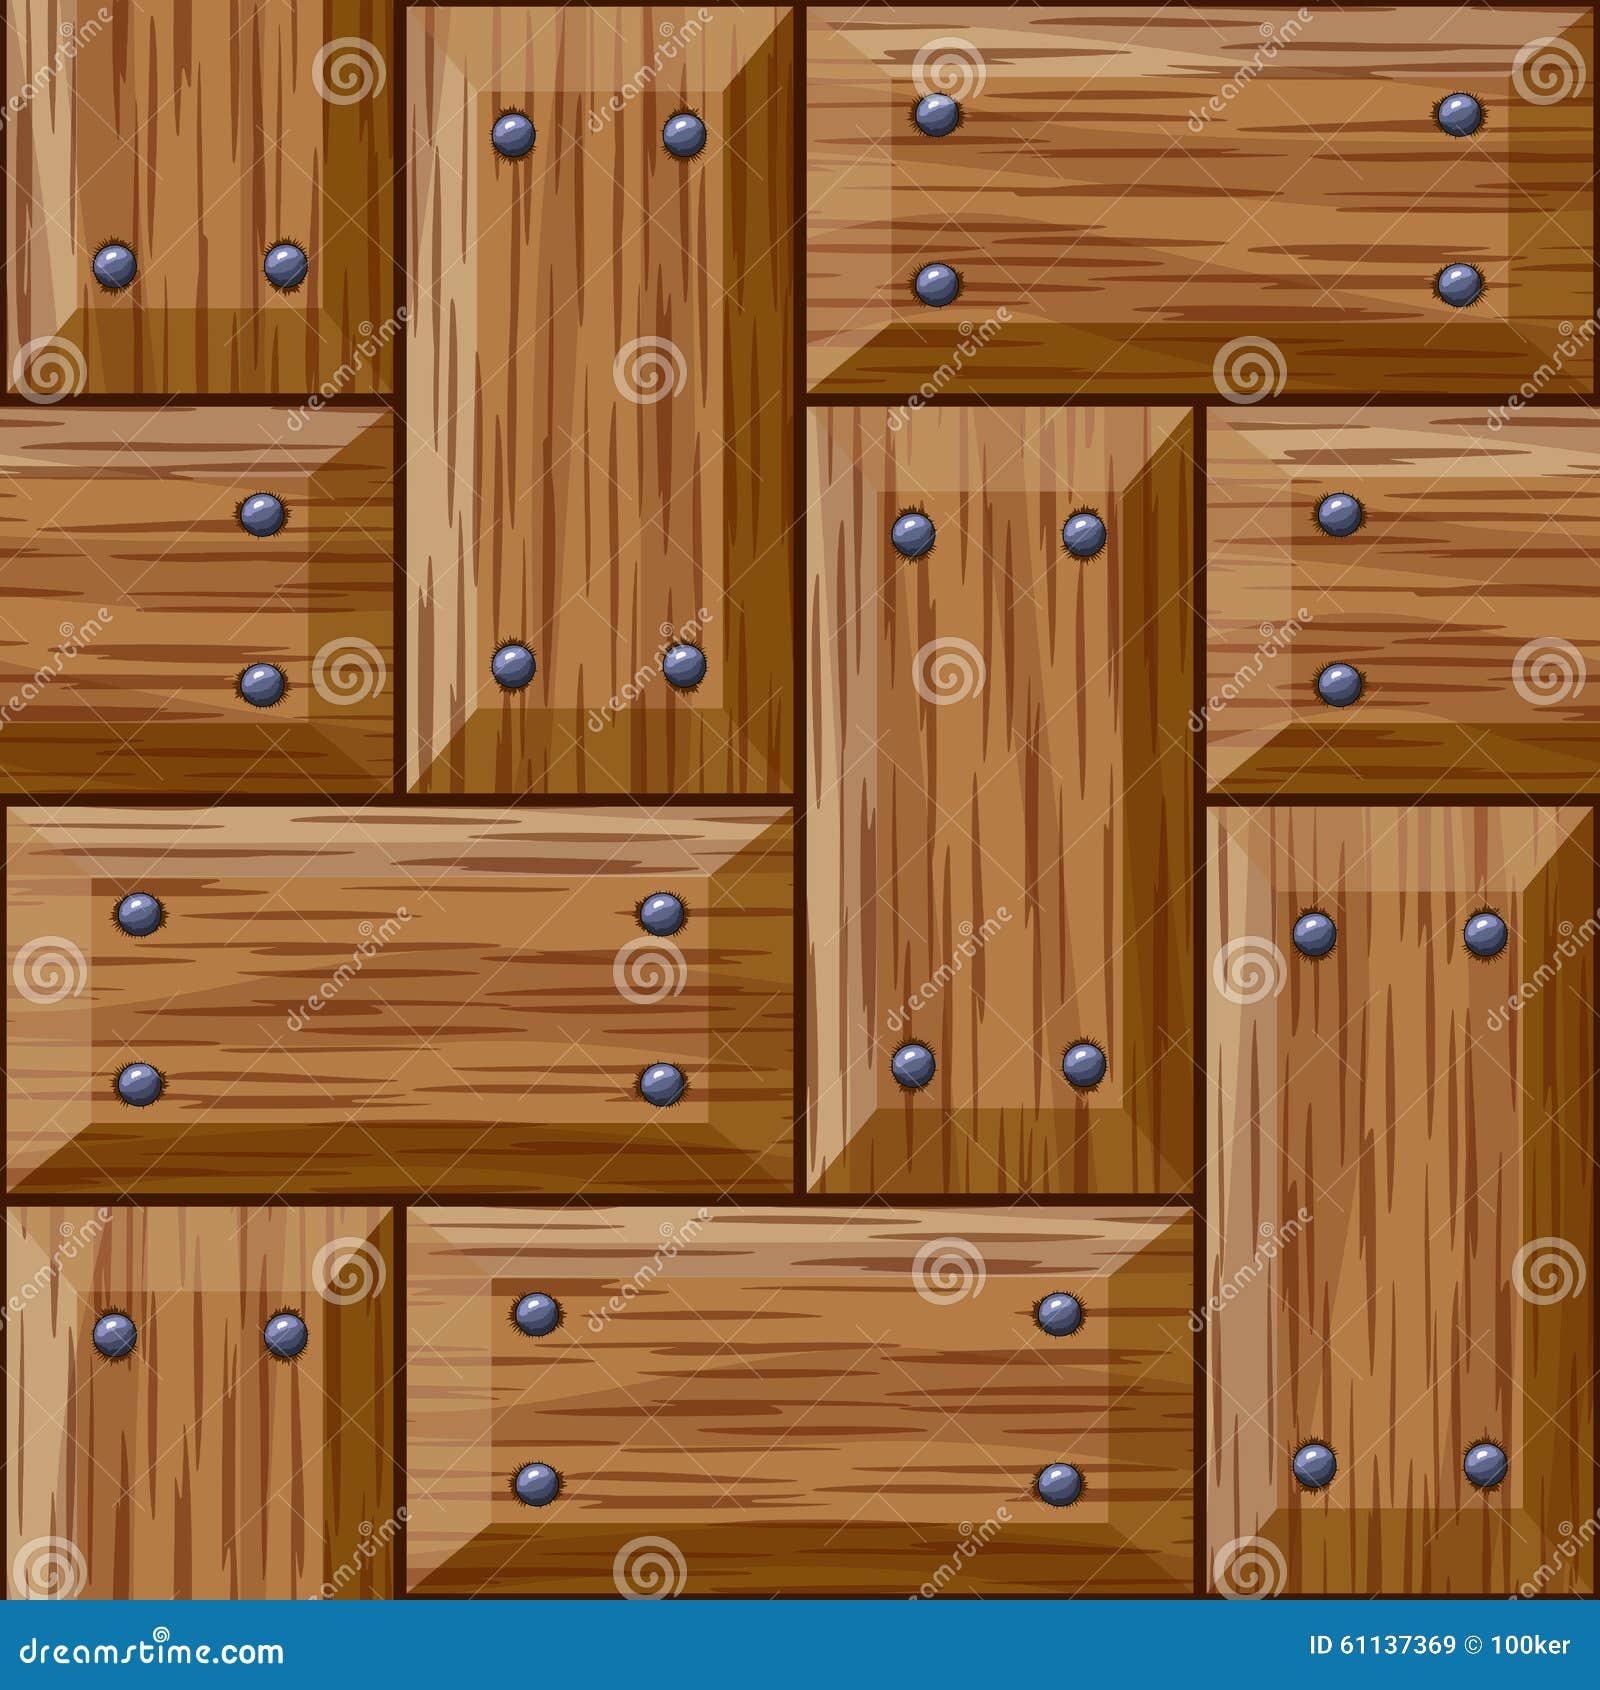 Seamless wooden panel door texture with nails stock vector